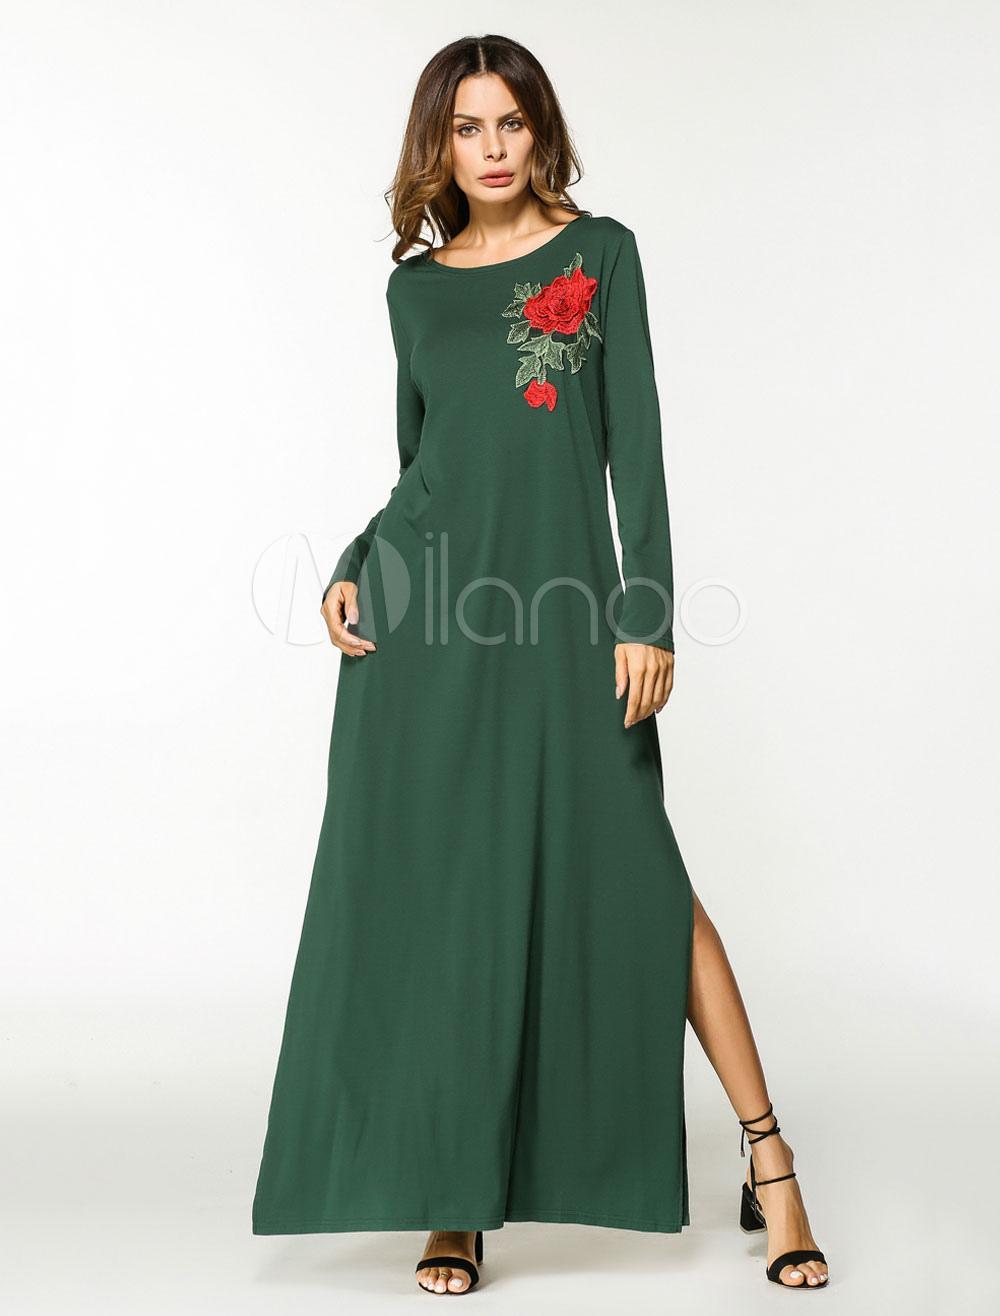 Women Kaftan Dress Green Floral Long Sleeve Split Maxi Tunic Dress (Women\\'s Clothing Arabian Clothing) photo